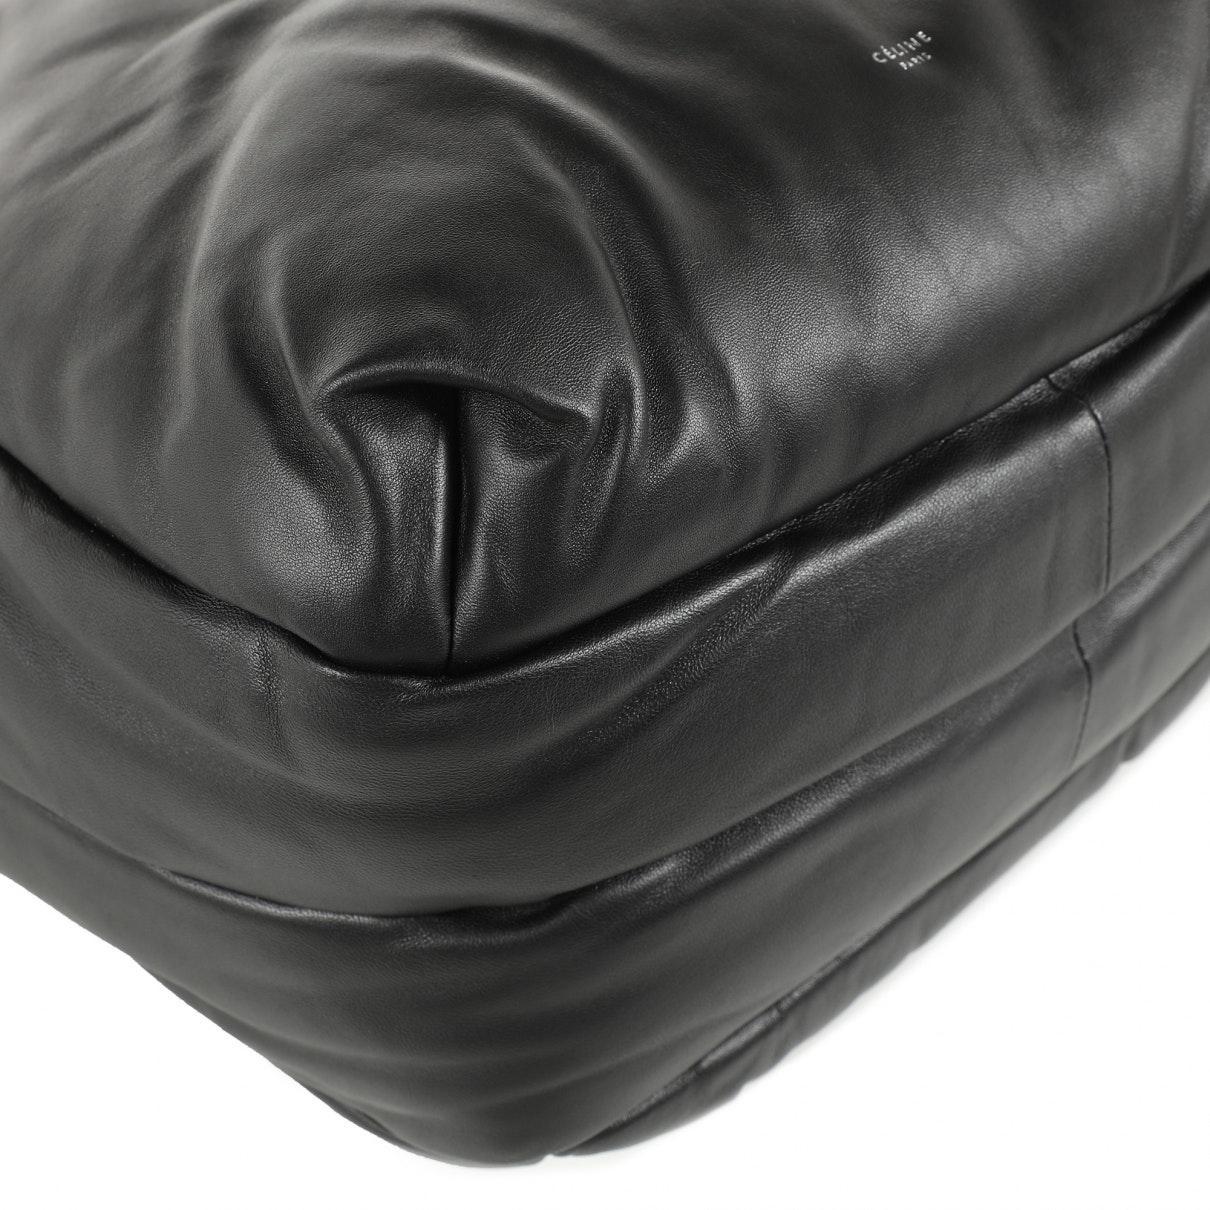 Sac à main en Cuir Noir Cuir Celine en coloris Noir